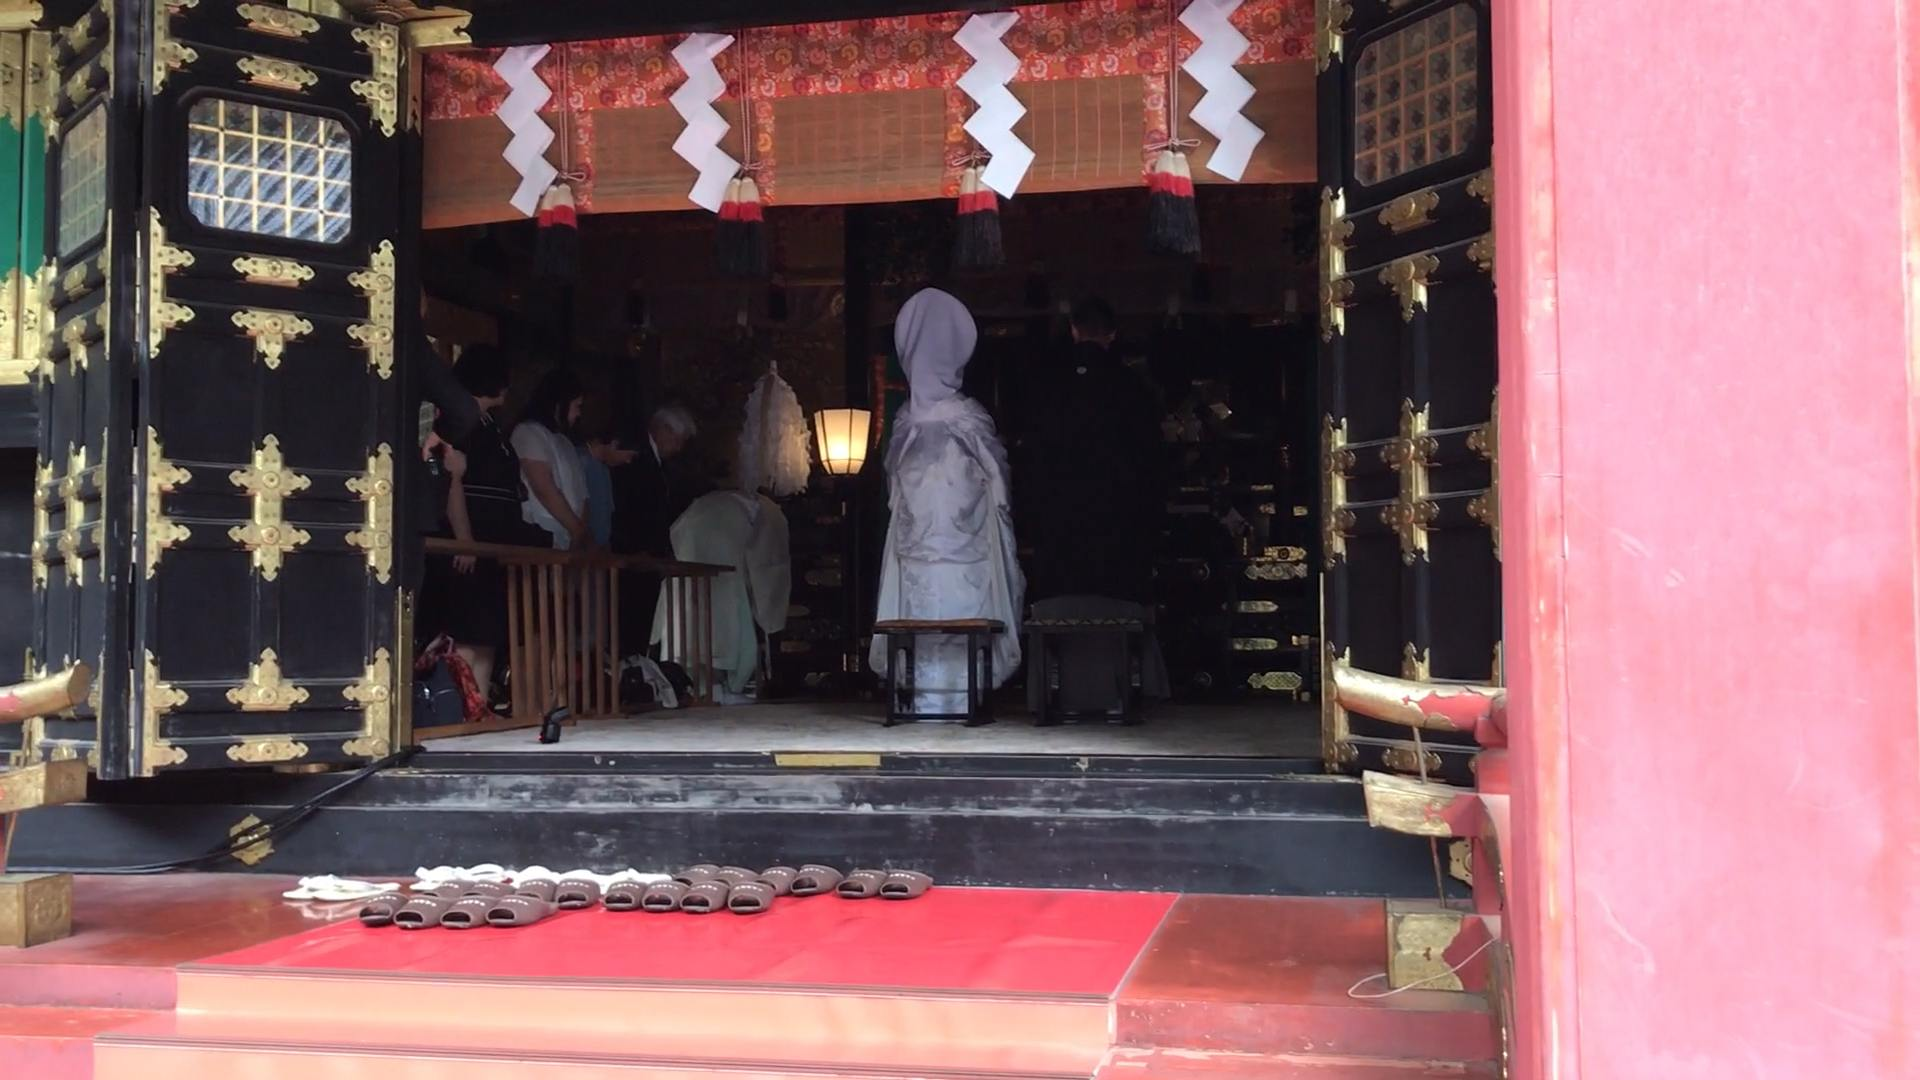 Traditional Shinto Wedding - Nikko Toshogu Shrine Japan Review Blog Guide List View Video 2017 ⛩ 🏯 🌸